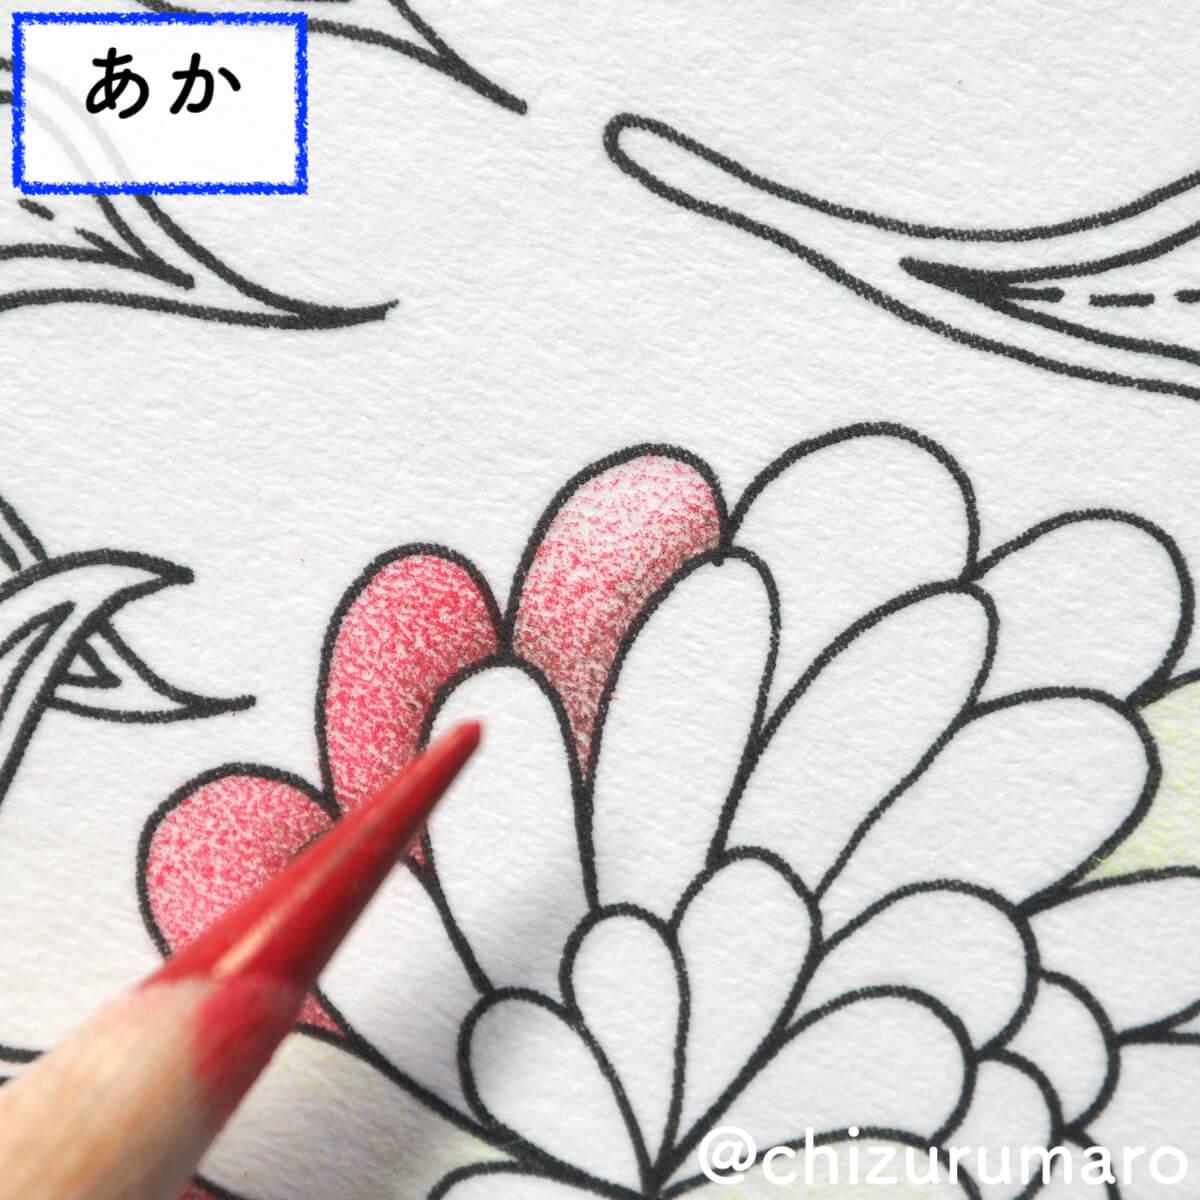 f:id:chizurumaro:20200511124911j:plain